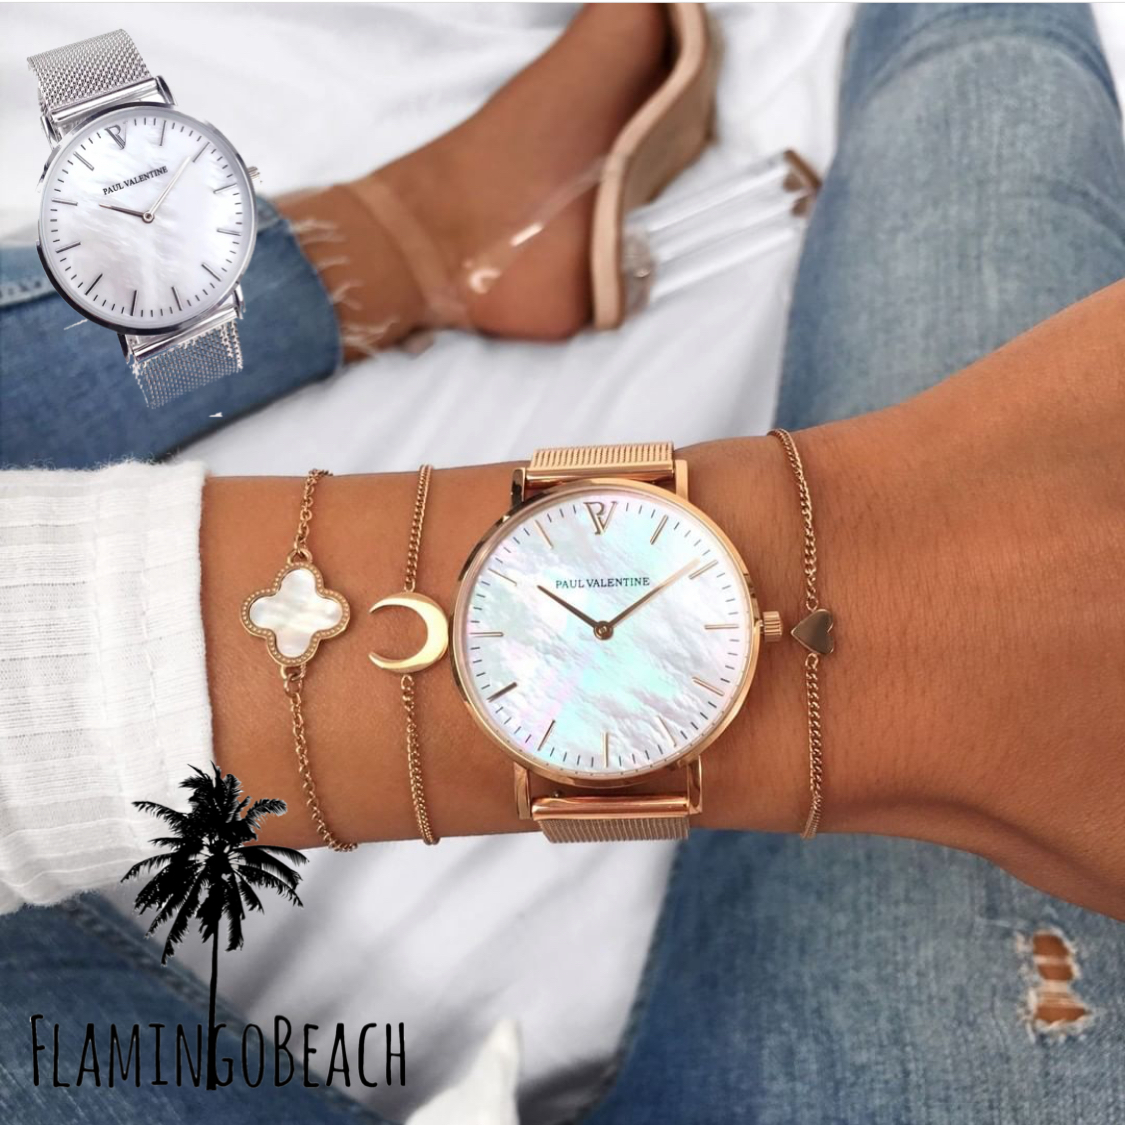 【FlamingoBeach】shell watch シェル 文字盤 腕時計